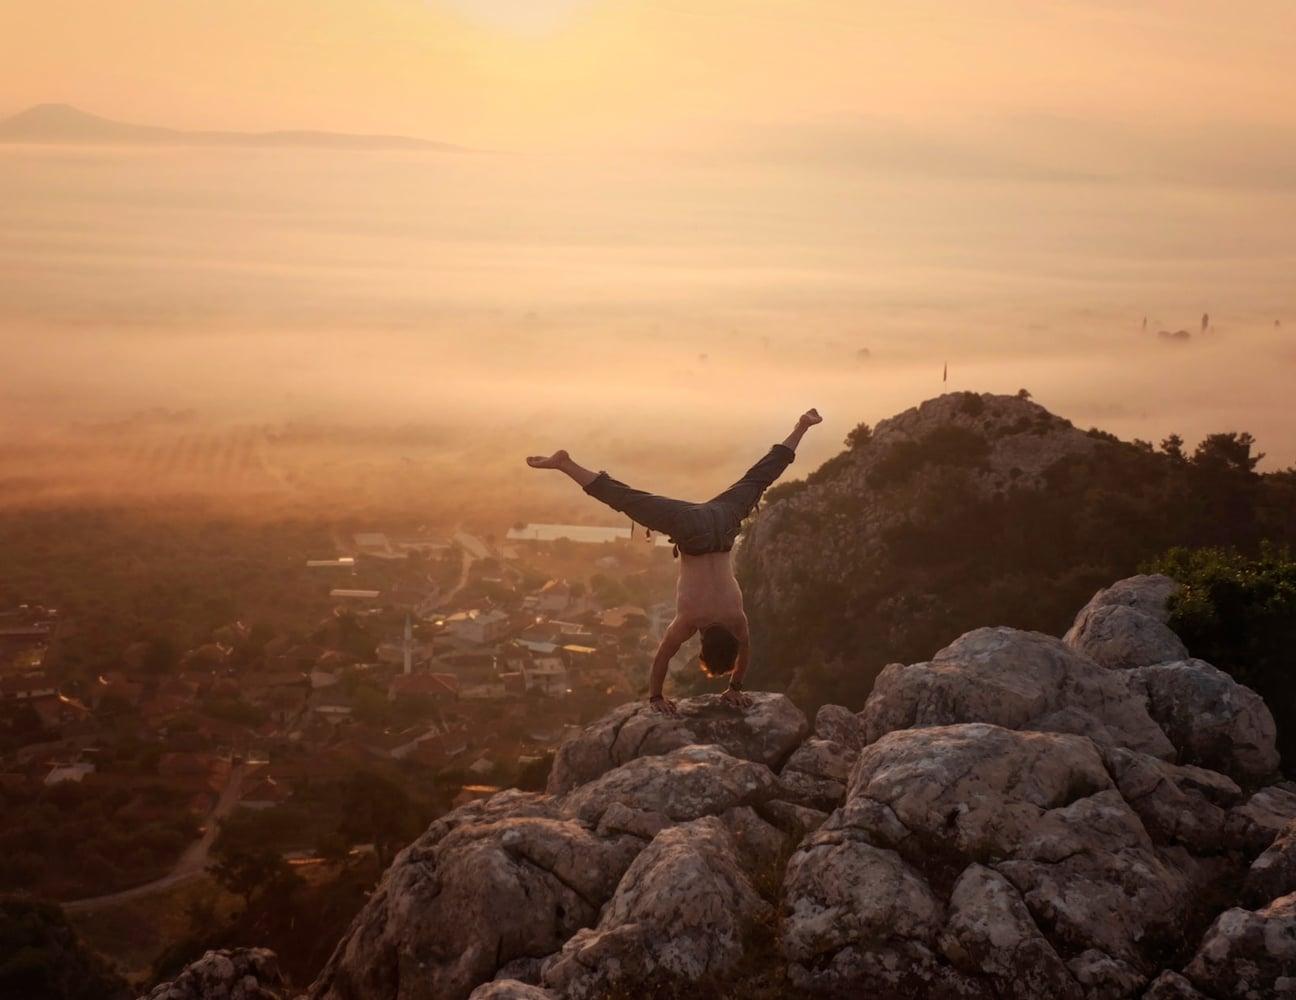 Man handstanding on a rock.